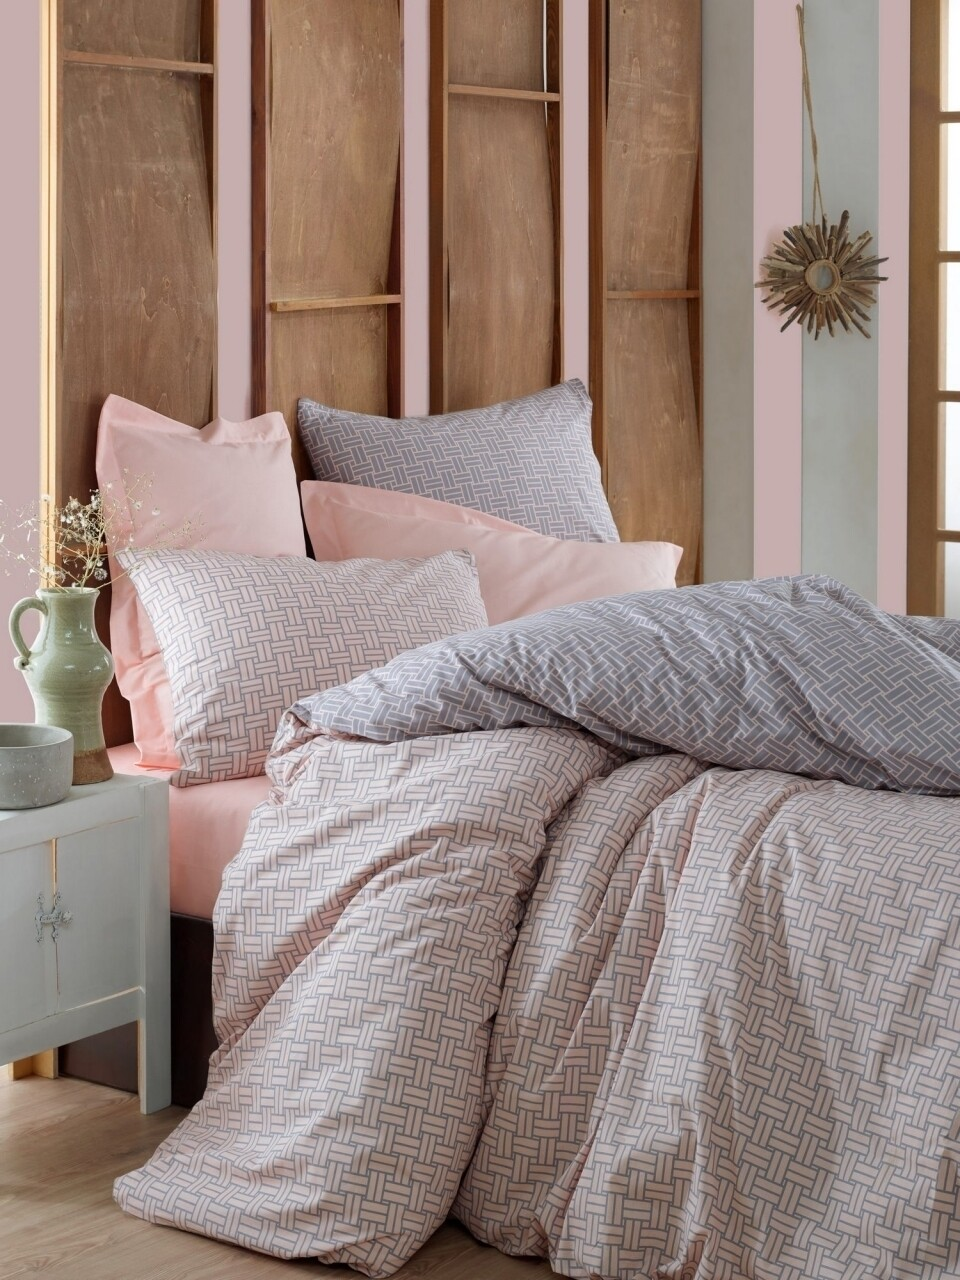 Lenjerie de pat pentru o persoana, 3 piese, 100% bumbac ranforce, Cotton Box, Must